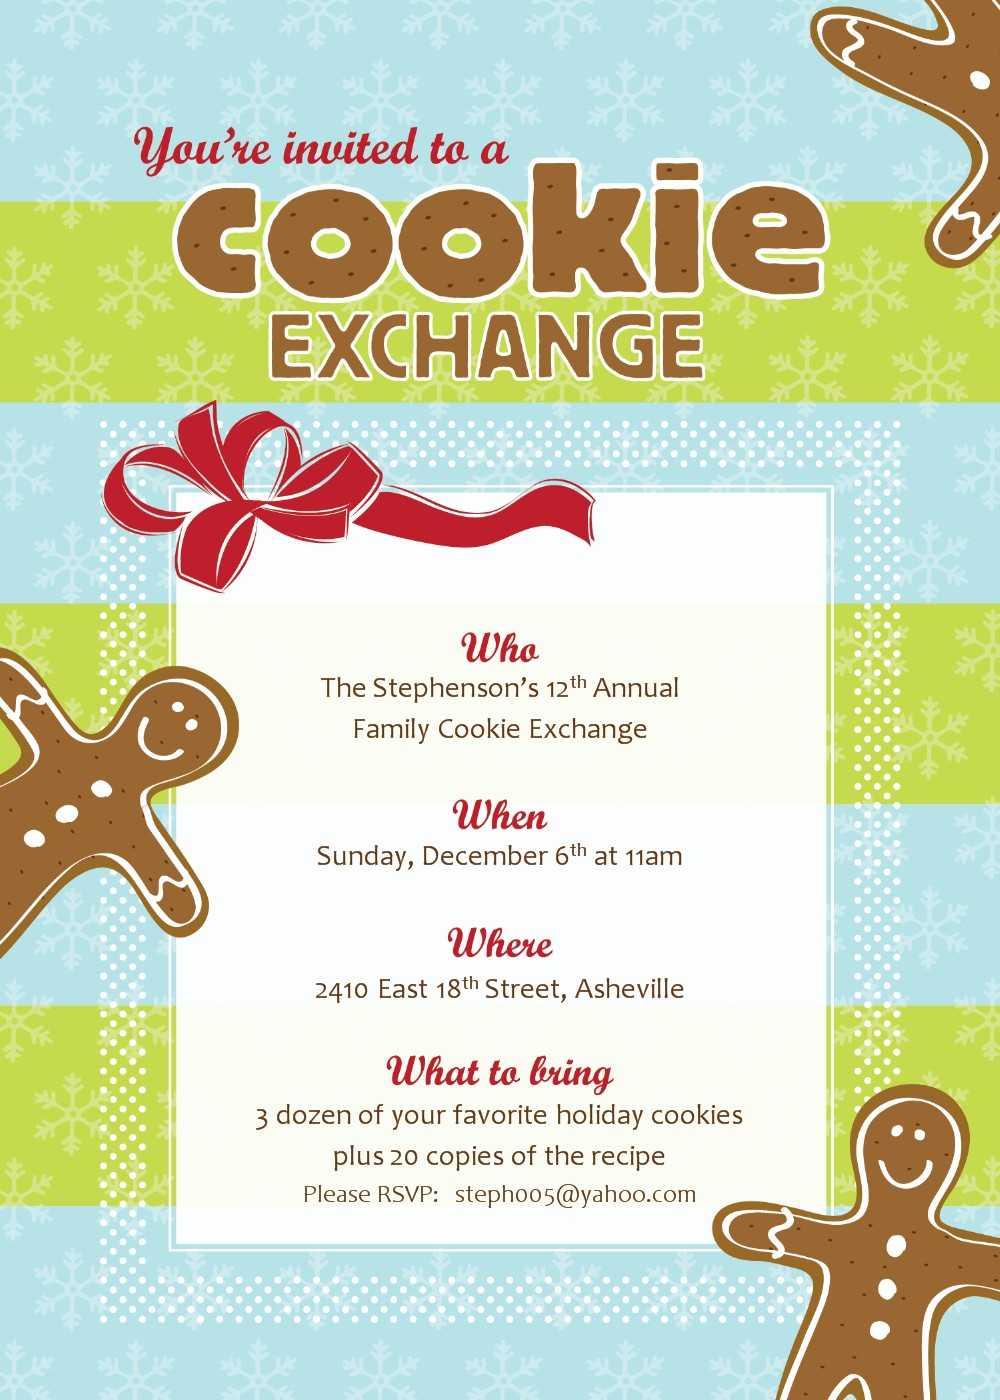 Best Photos Of Cookie Exchange Sign Up Template - Christmas regarding Cookie Exchange Recipe Card Template